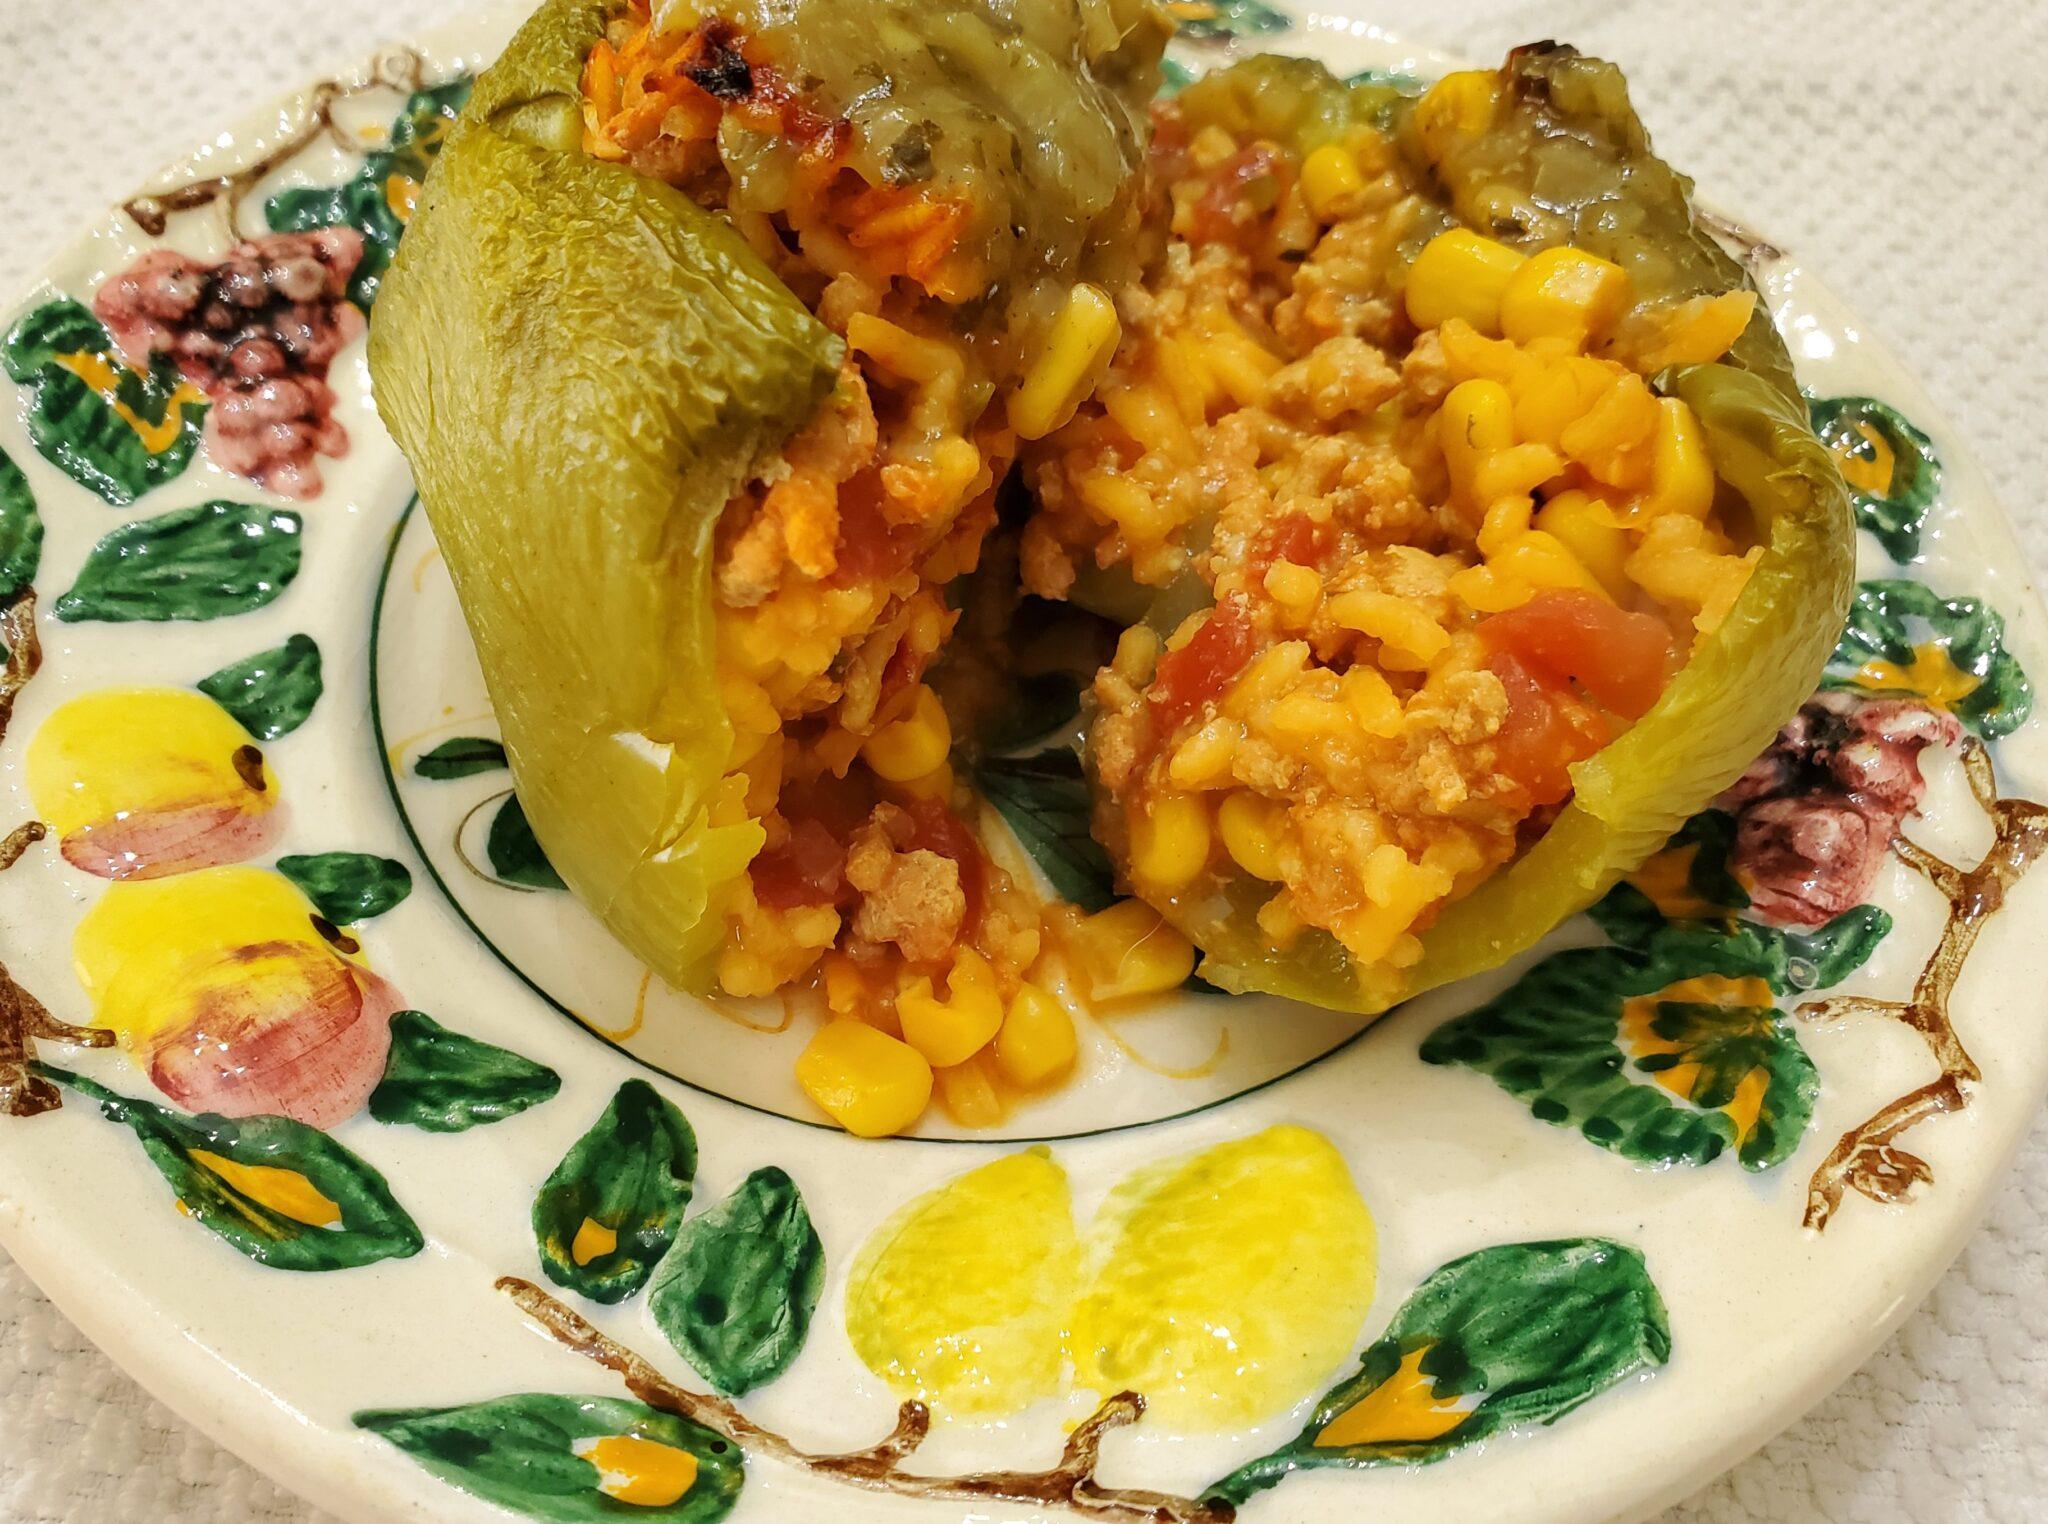 Turkey Taco Stuffed Peppers (1 WW SmartPoint)